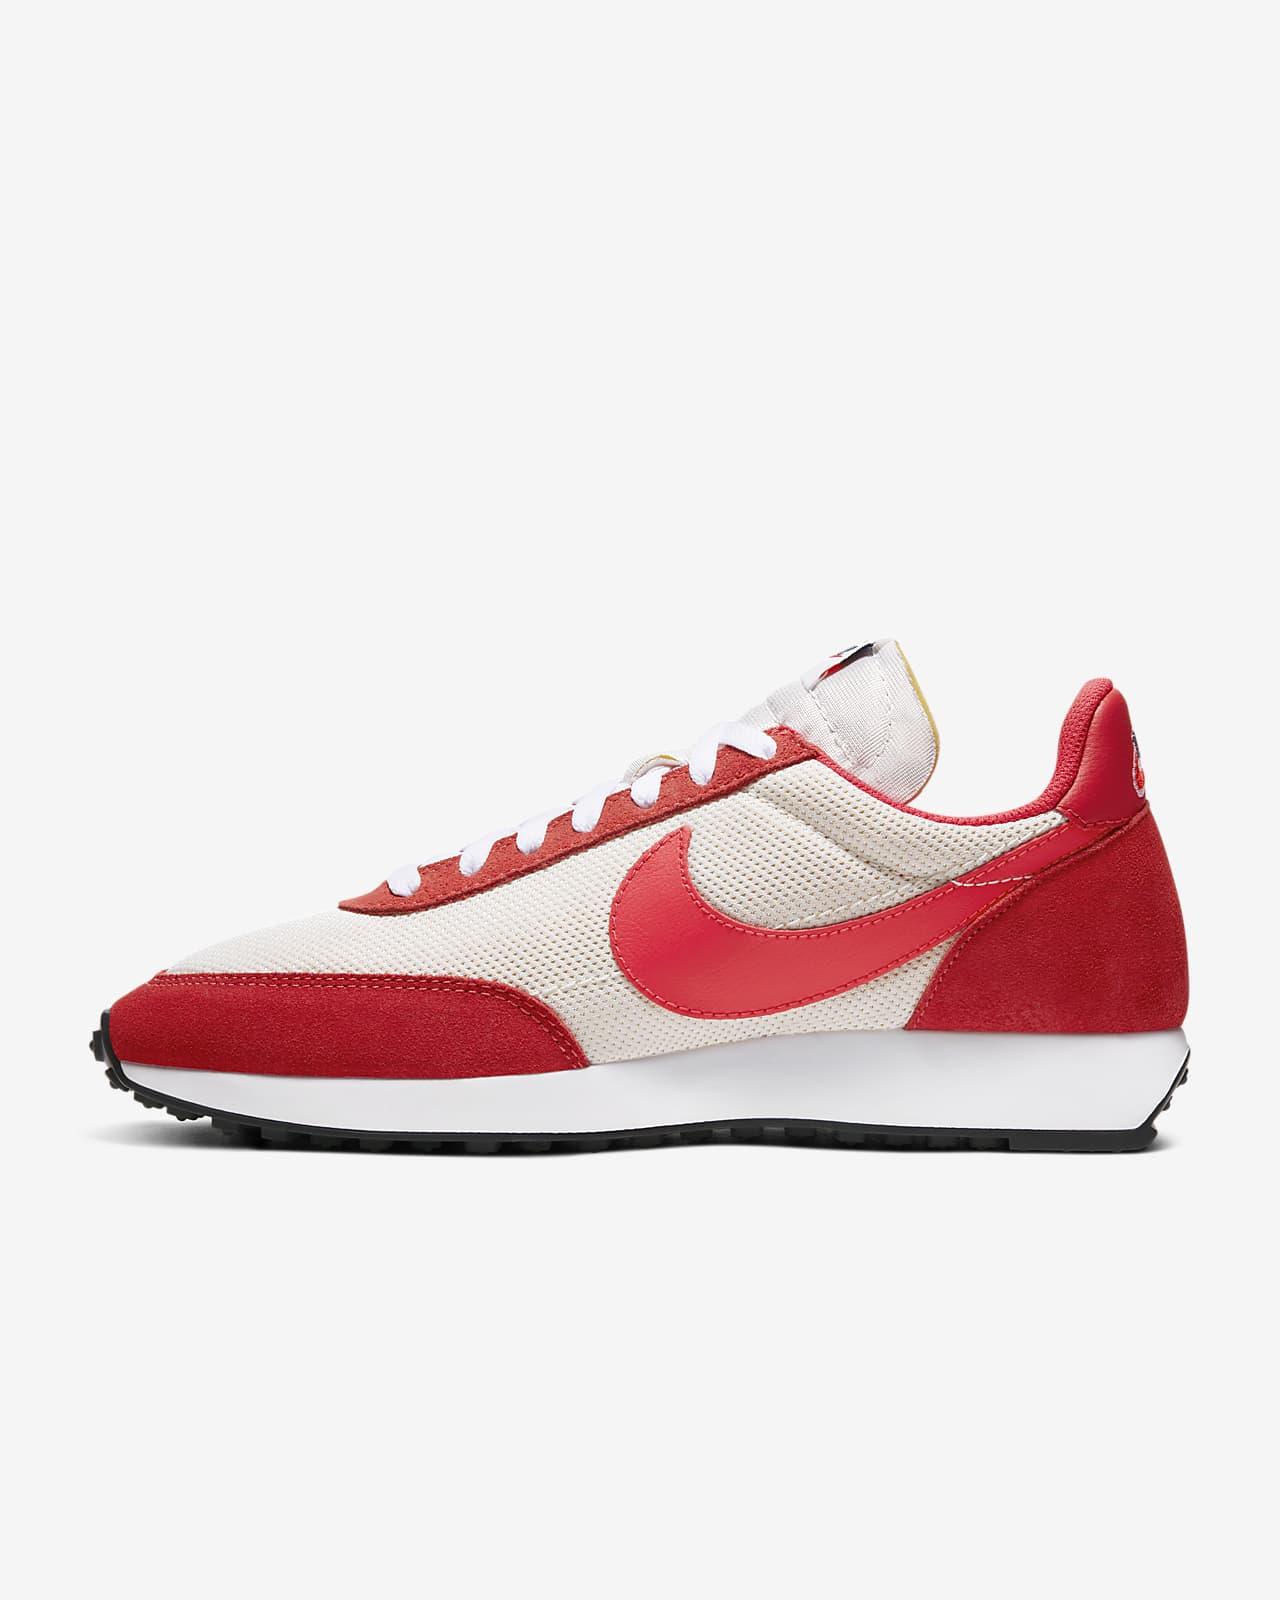 Nike Air Tailwind 79 Shoe